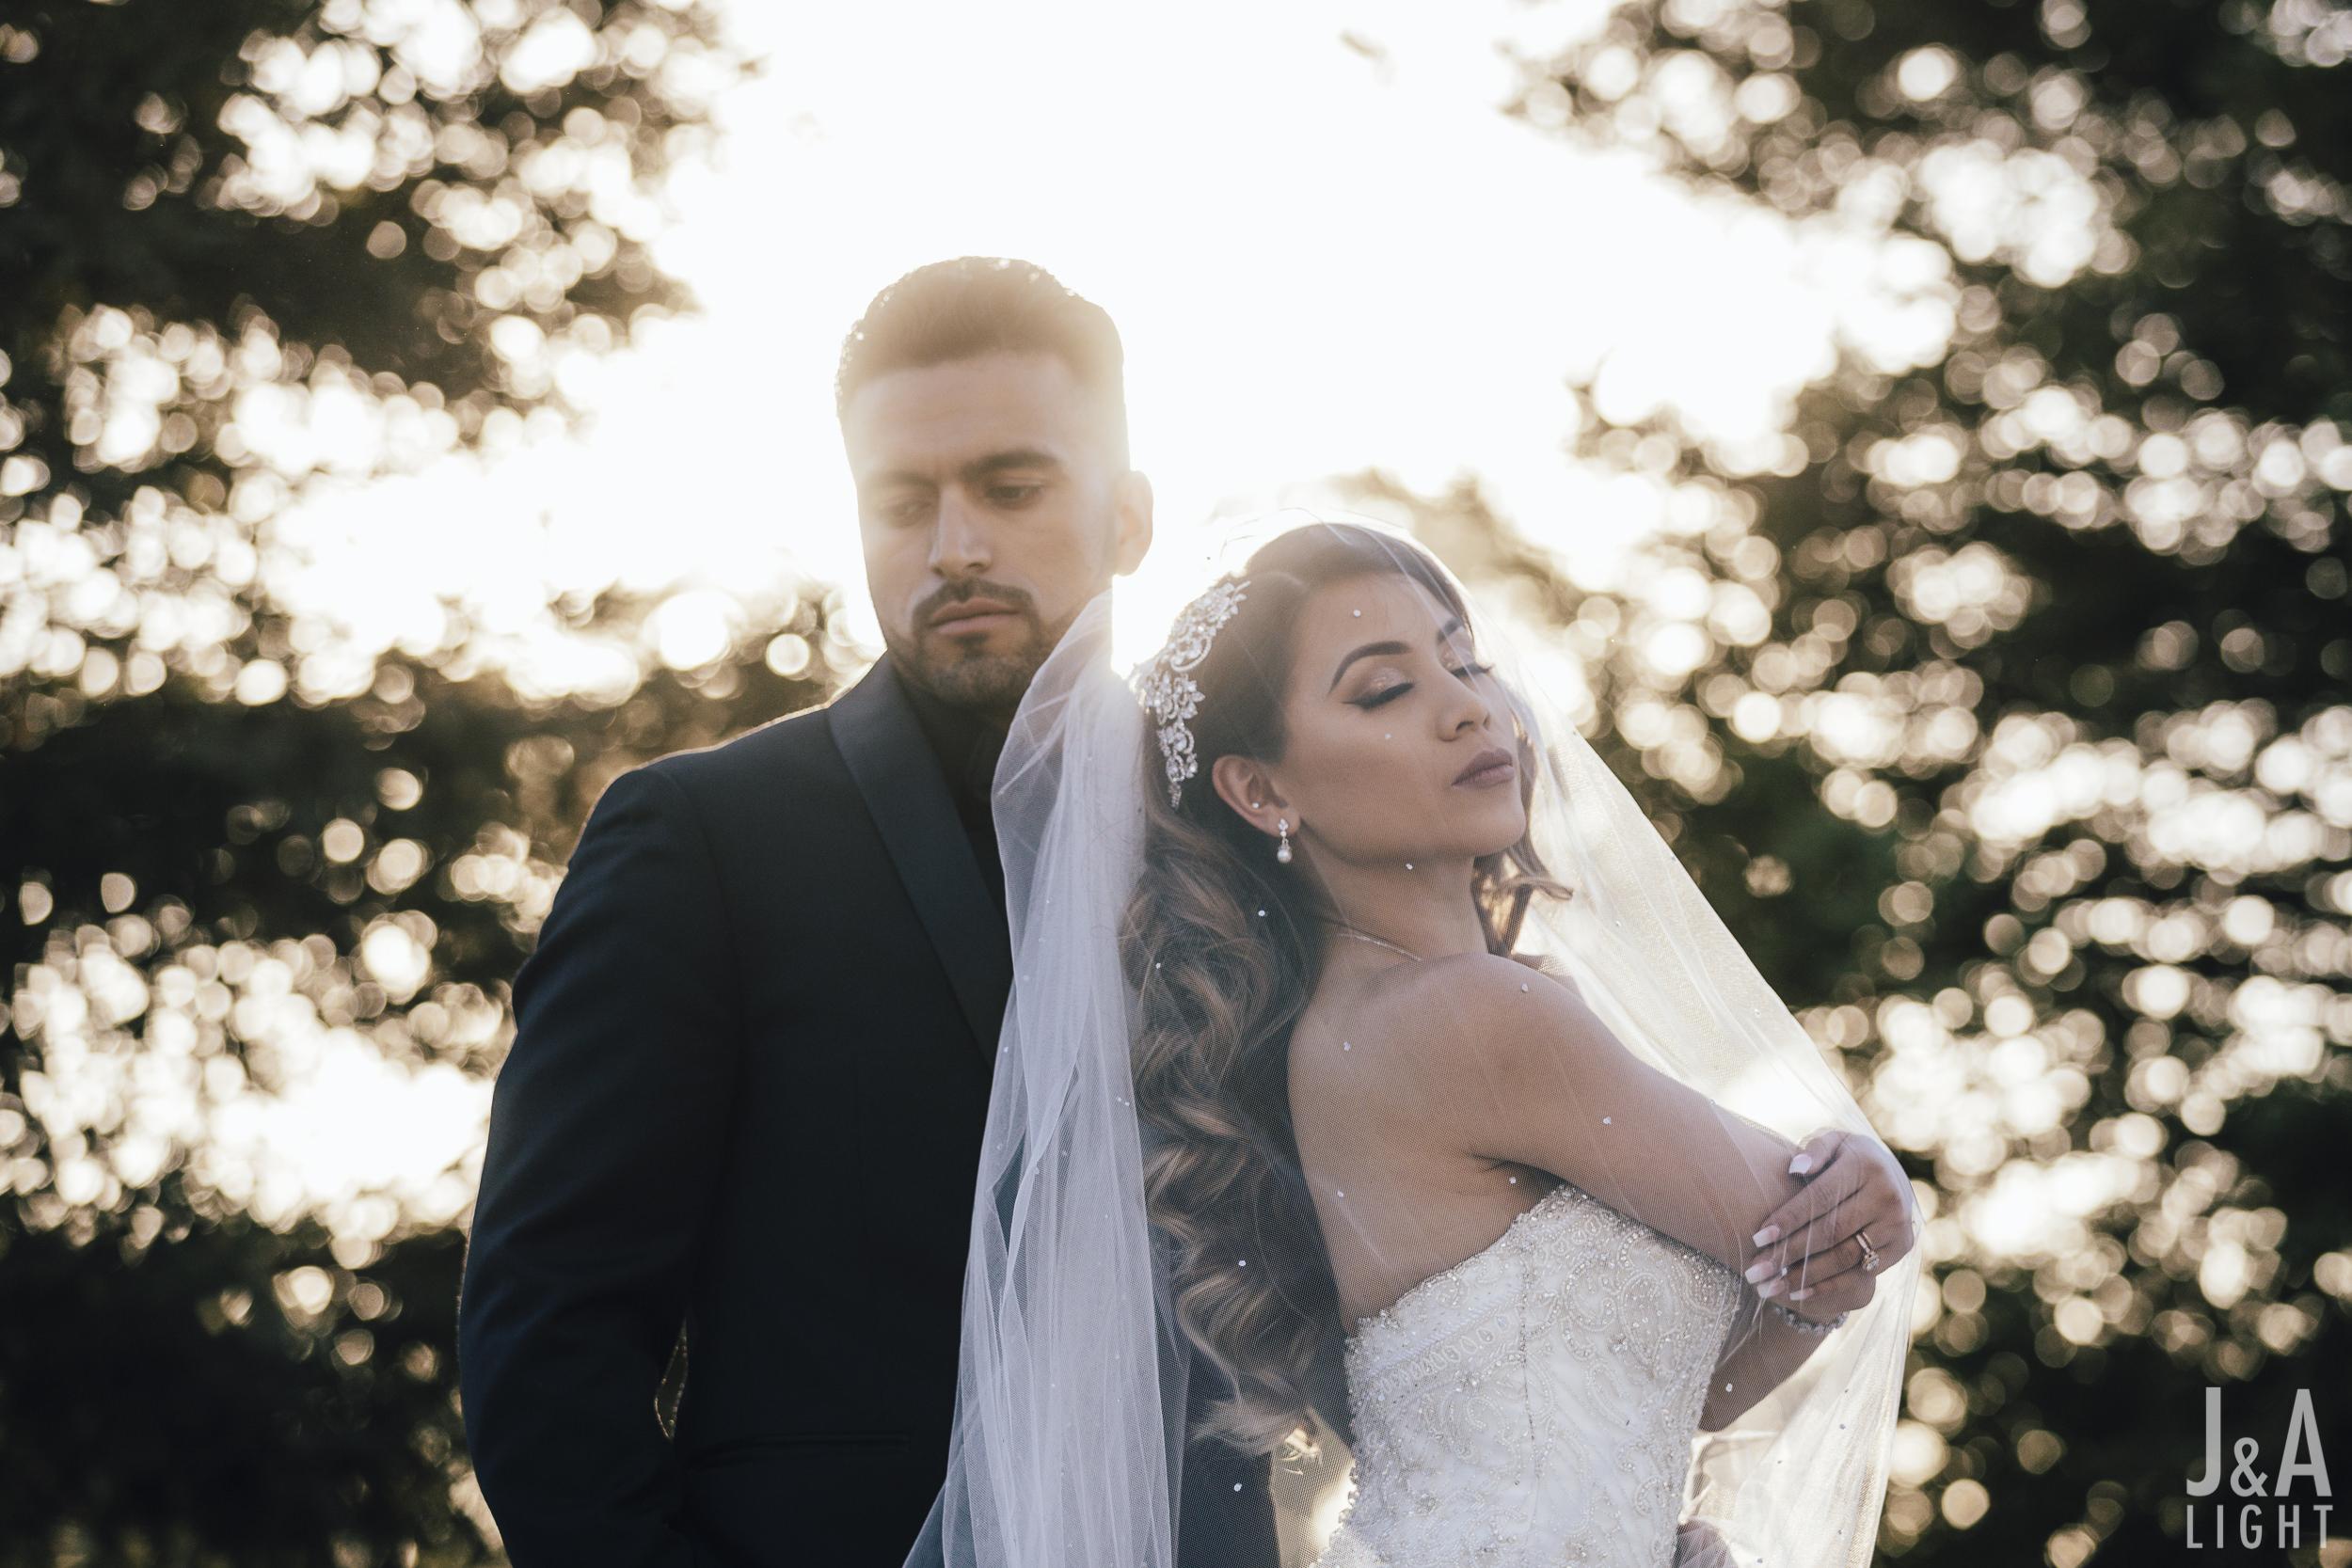 20171014-JanDan-LosBanos-GlassMansion-Wedding-Blog-046.jpg